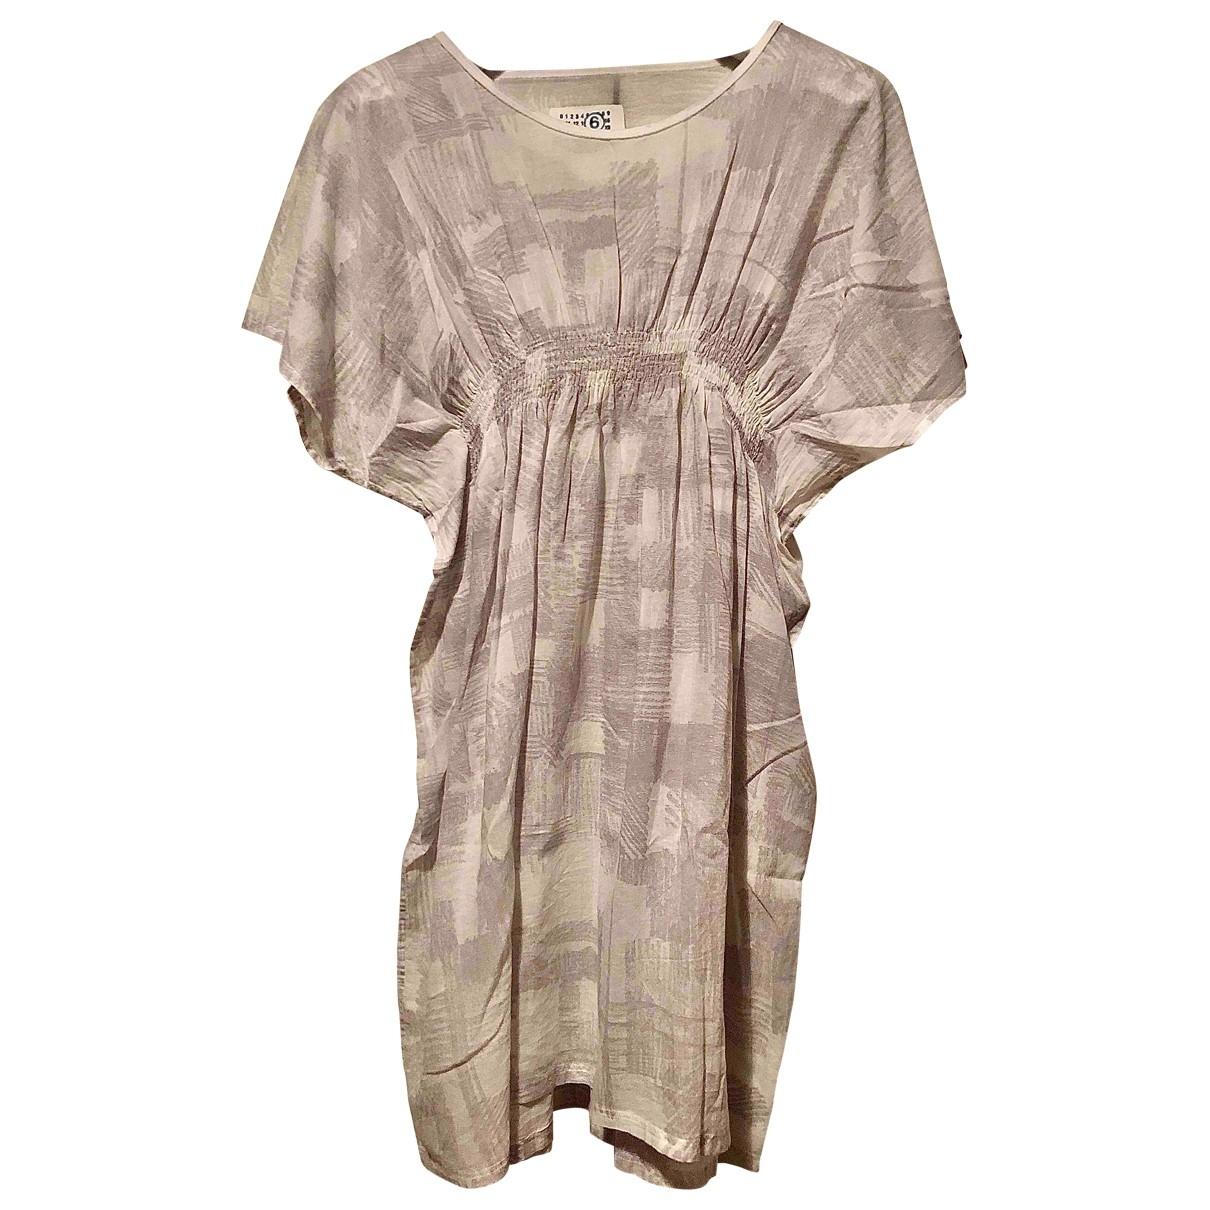 Mm6 \N White Cotton dress for Women 44 IT